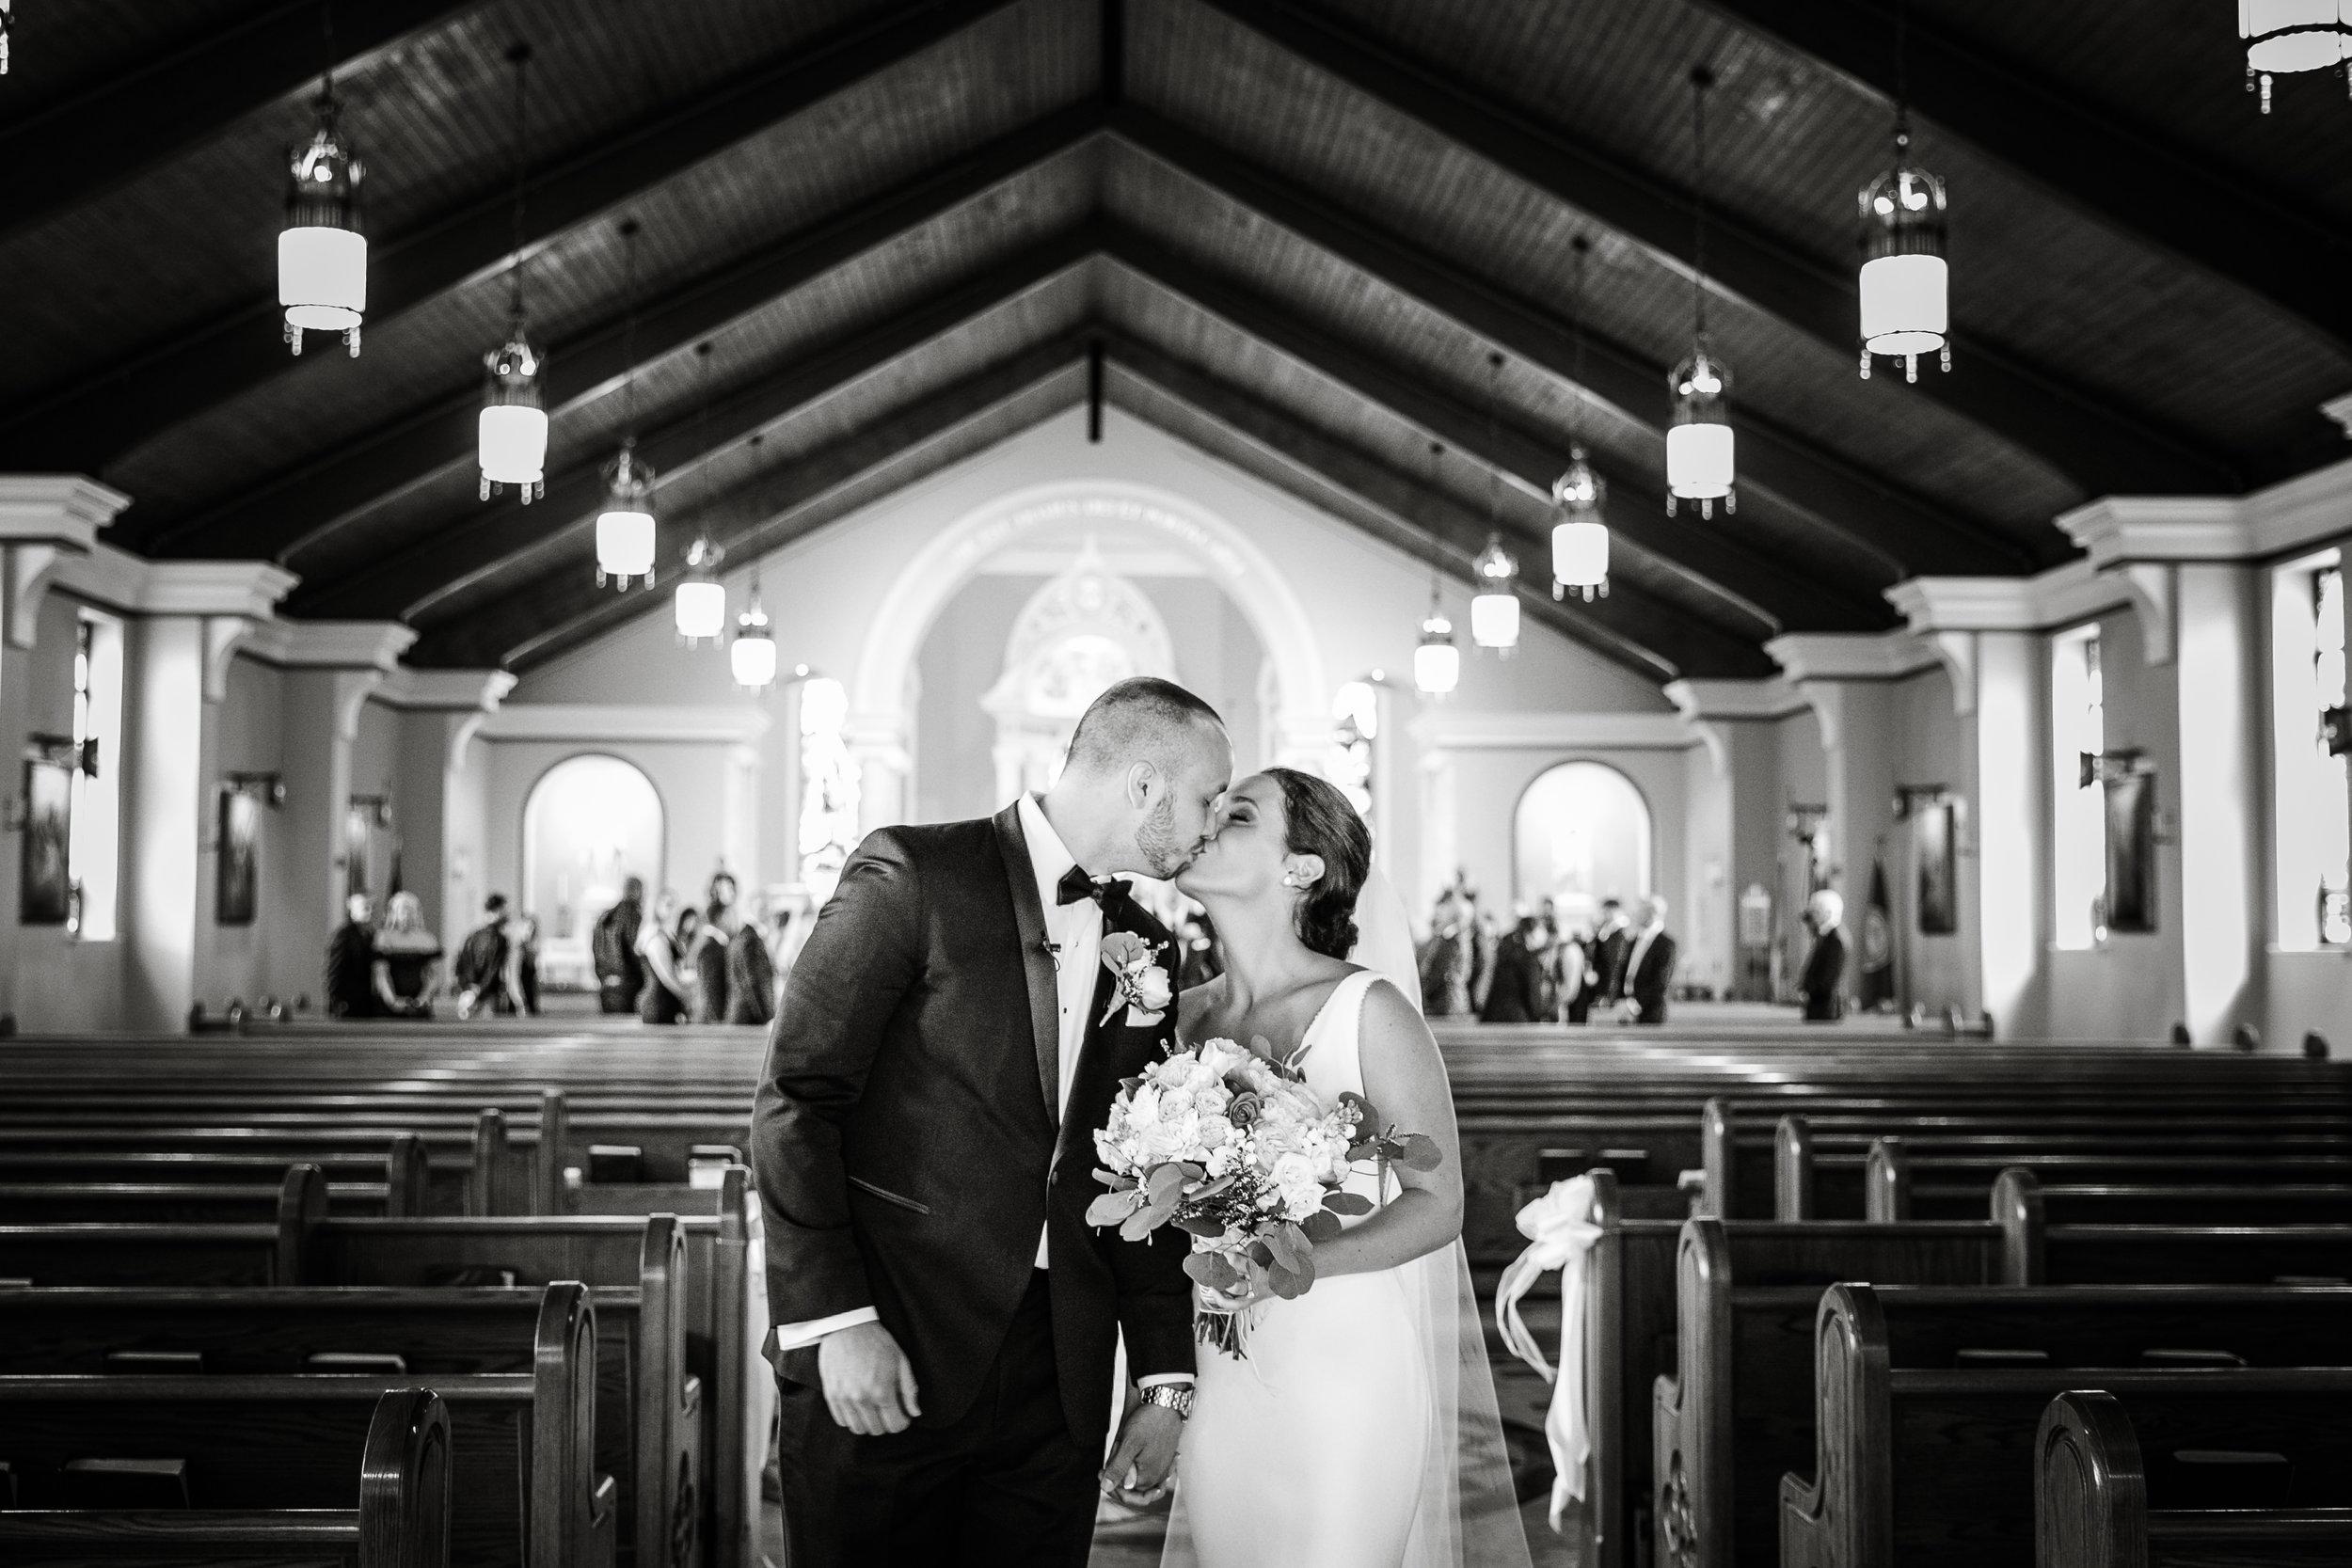 Sam and Mikes Wedding Photos - Pen Ryn Estate - 397.jpg